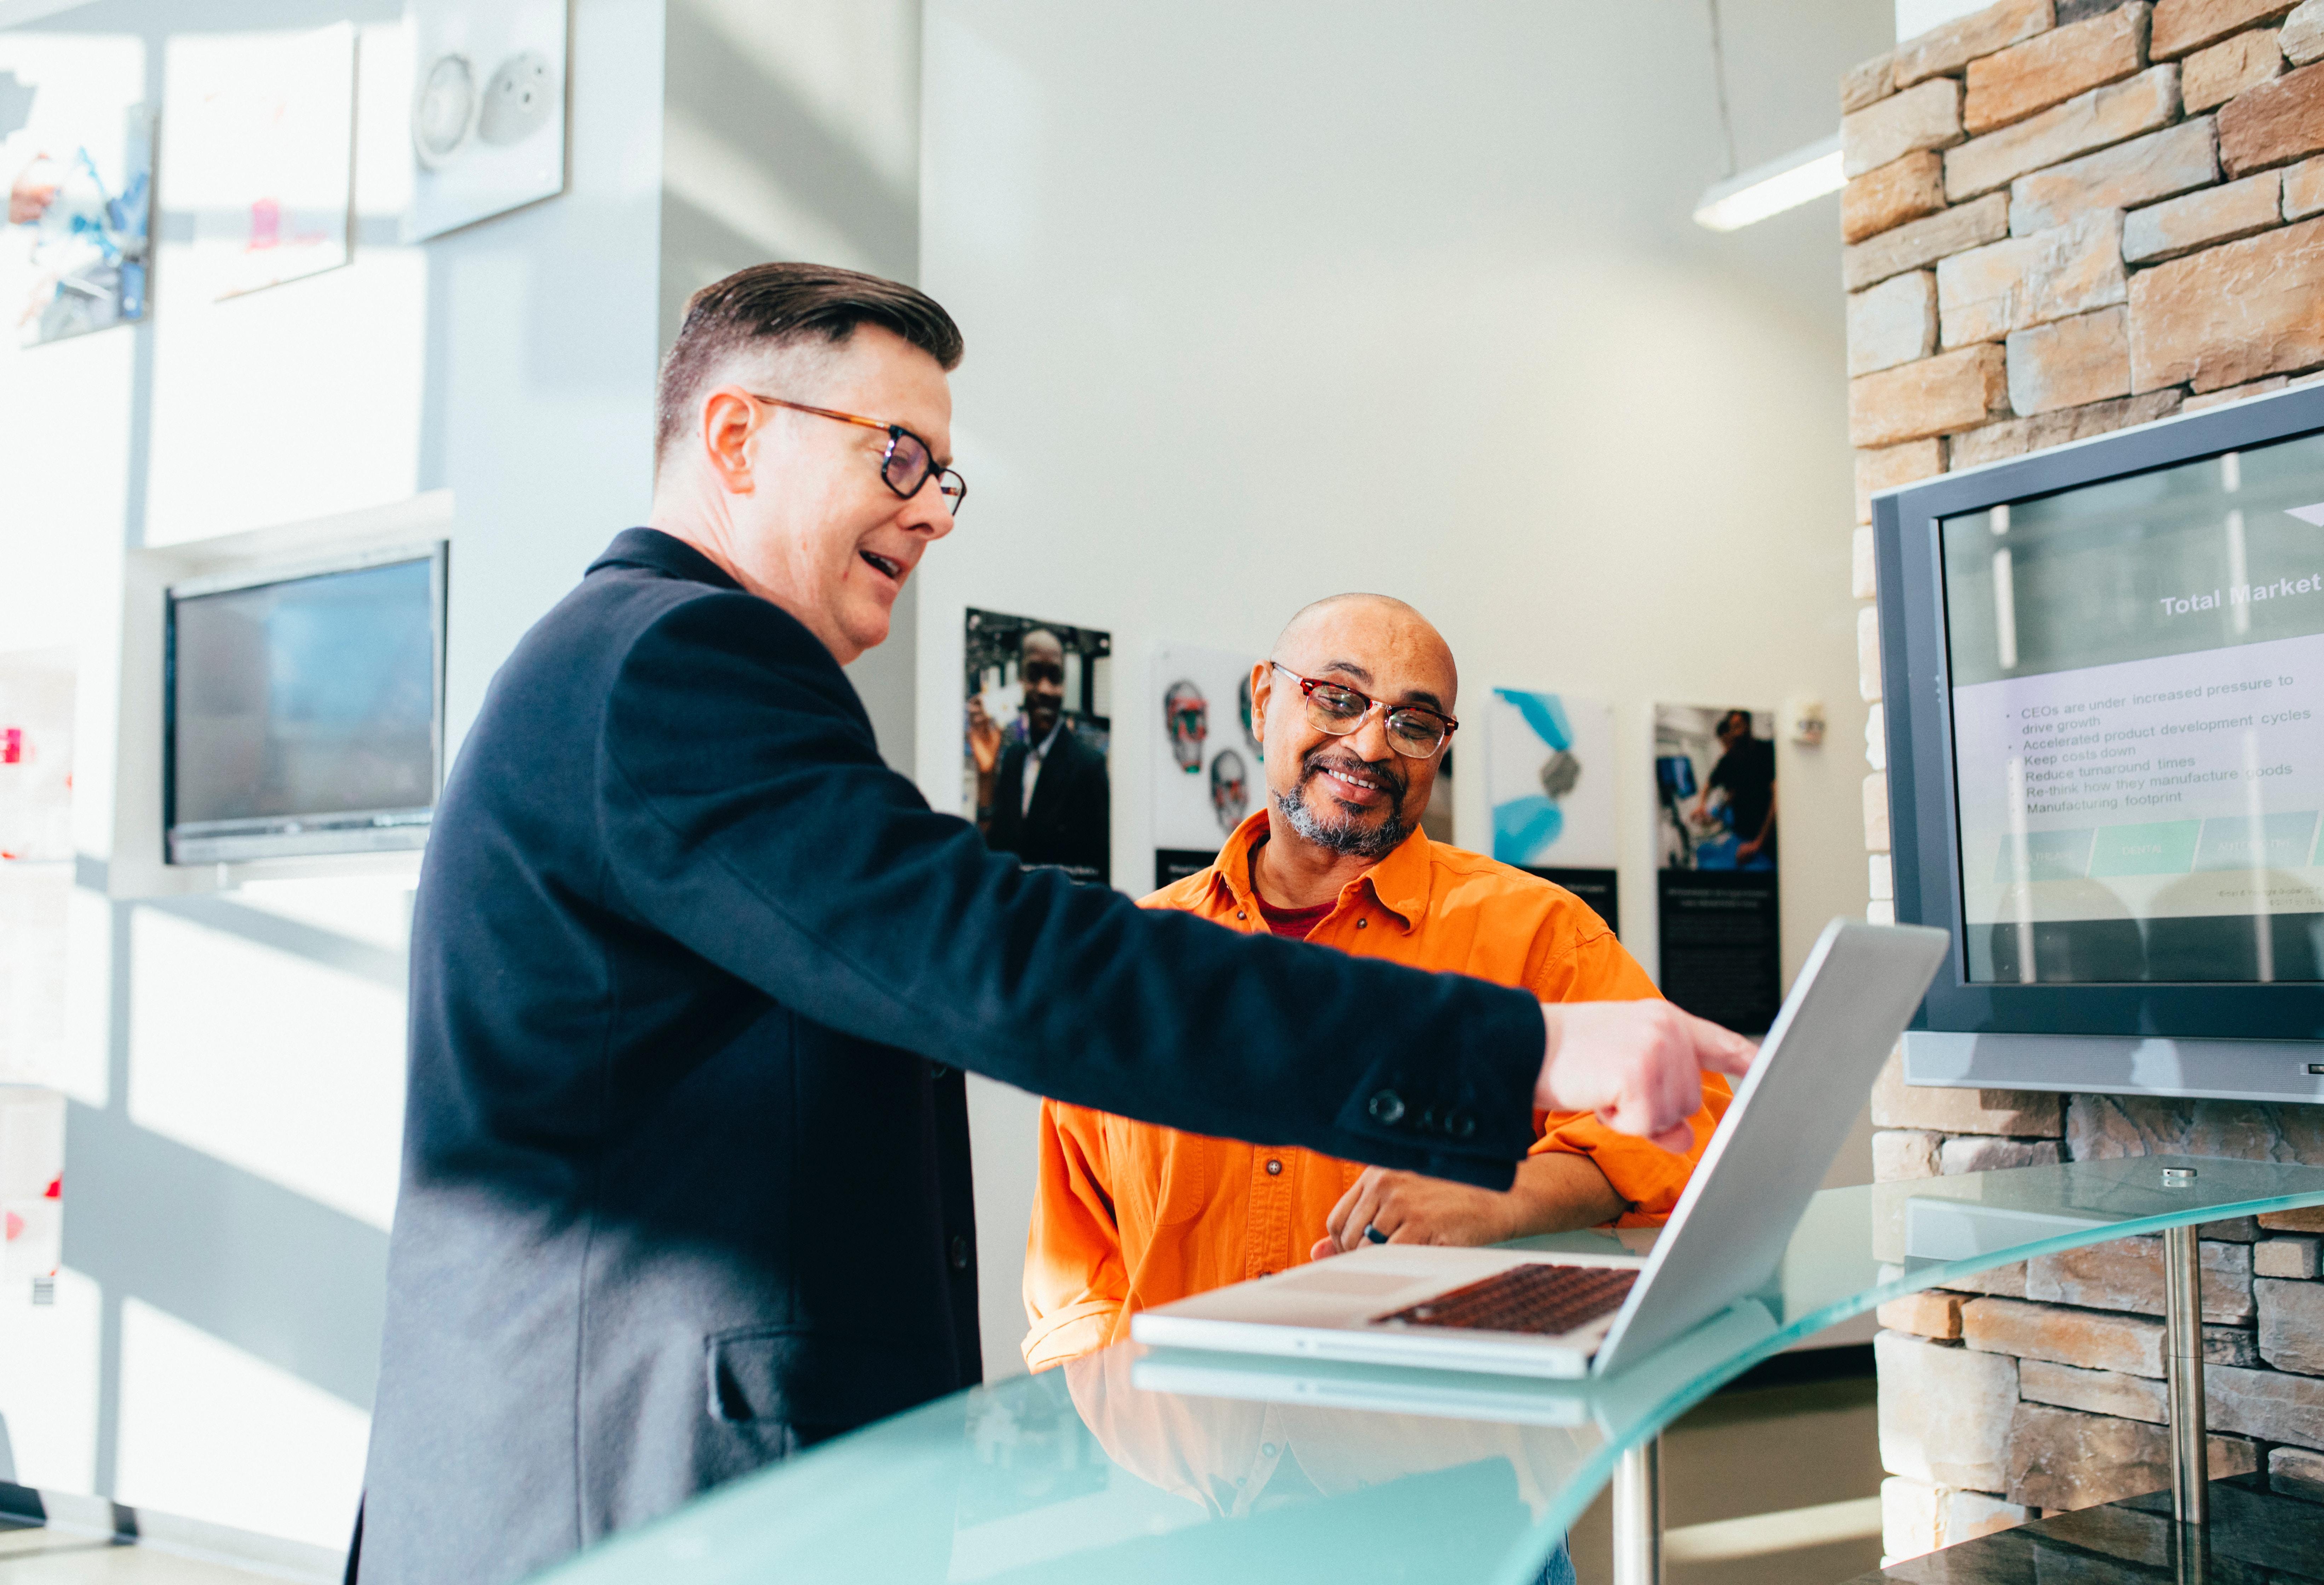 Management by Walking Around: A Business Management Technique